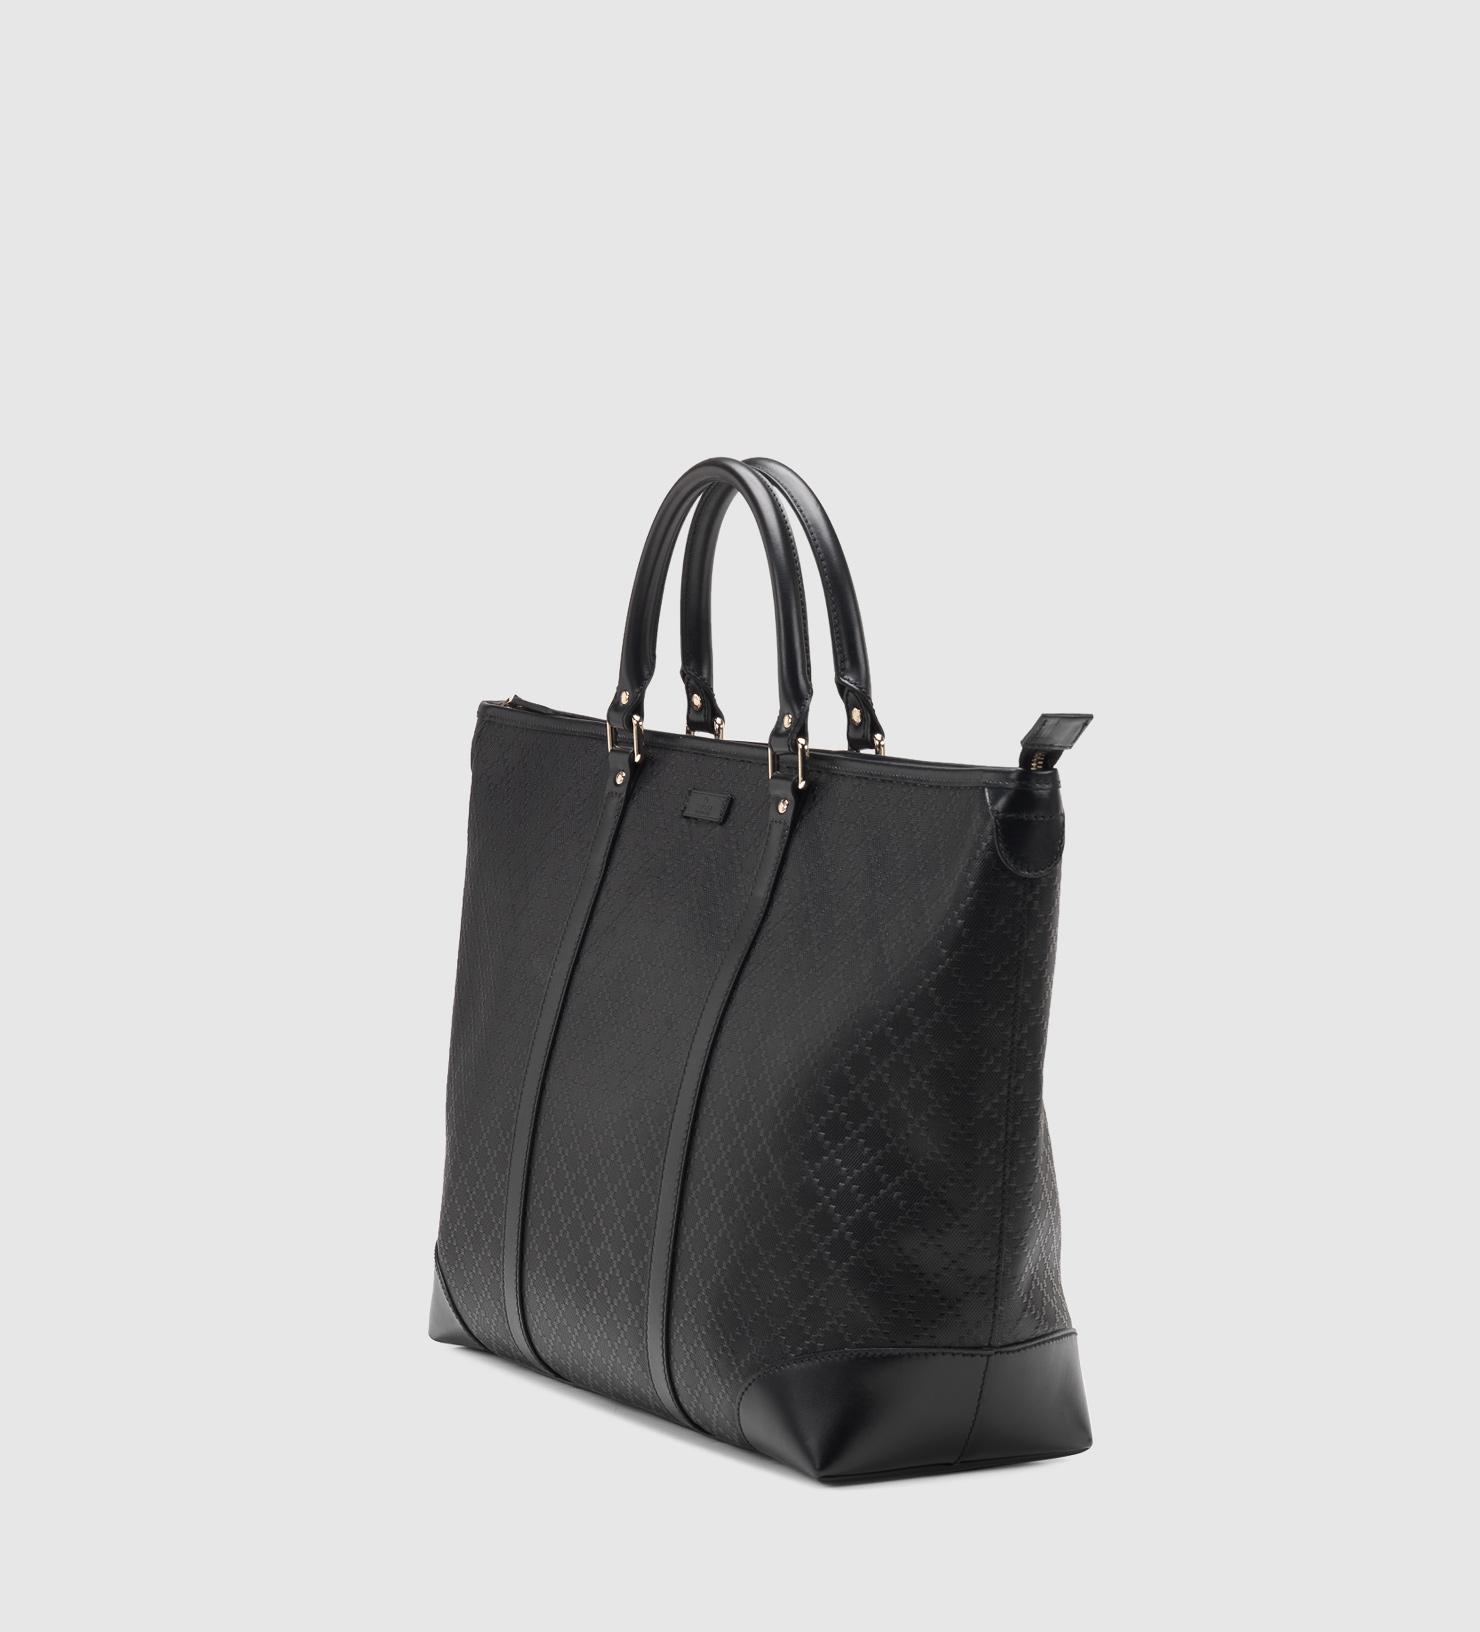 50791d9246f Lyst - Gucci Medium Black Diamante Leather Top Handle Tote in Black